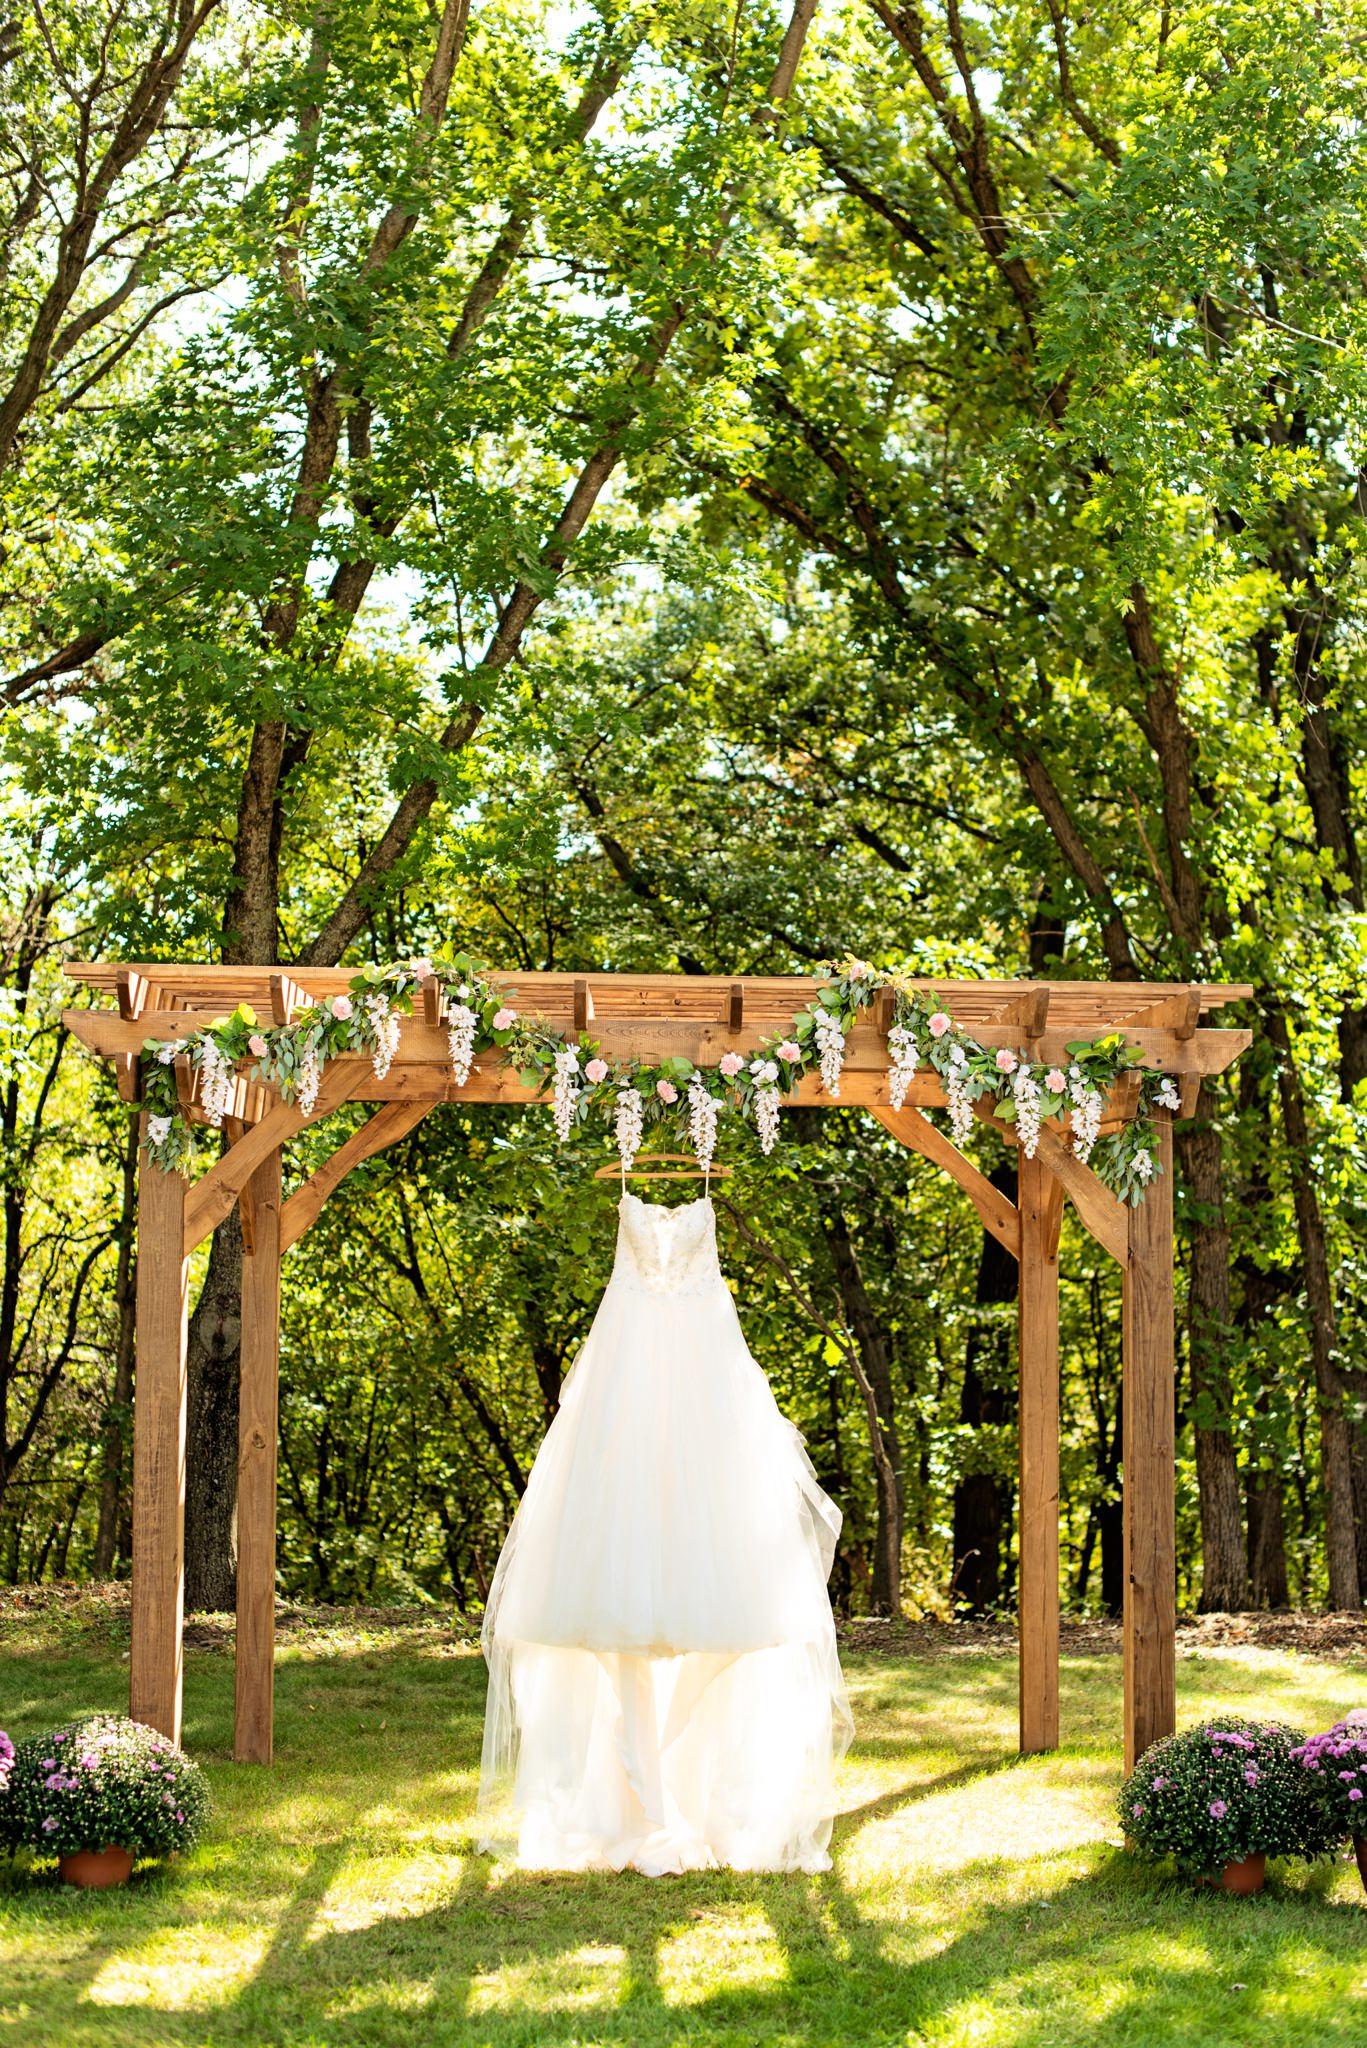 Brittany-Jay-Wedding-091518-Rotella-Photography-1_BLOG.jpg